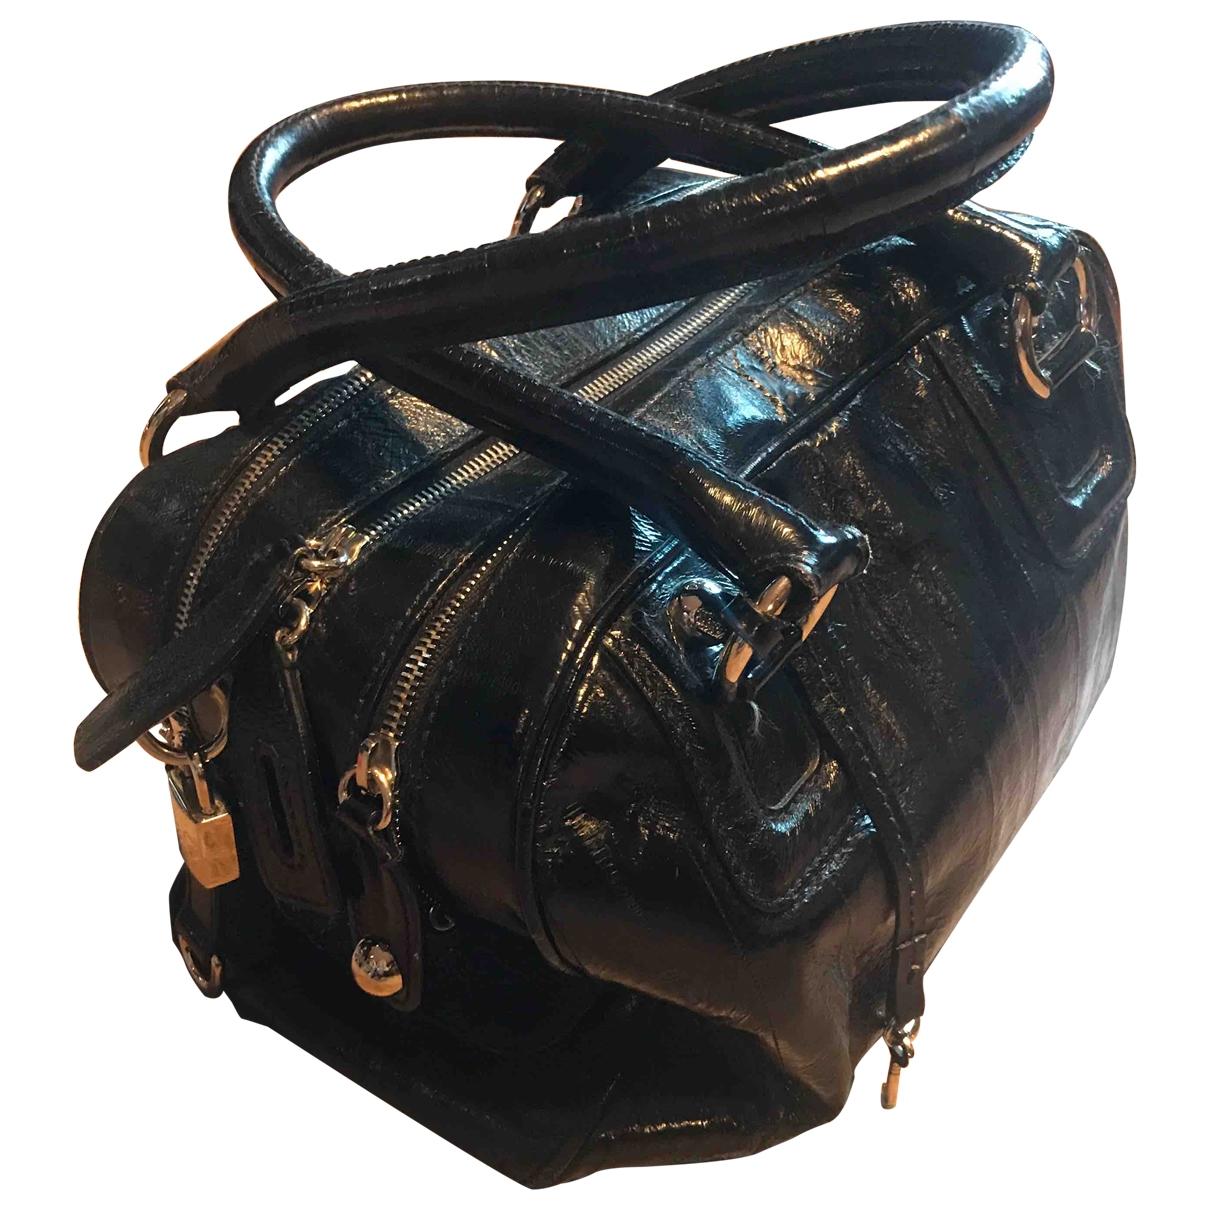 D&g \N Black Lizard handbag for Women \N